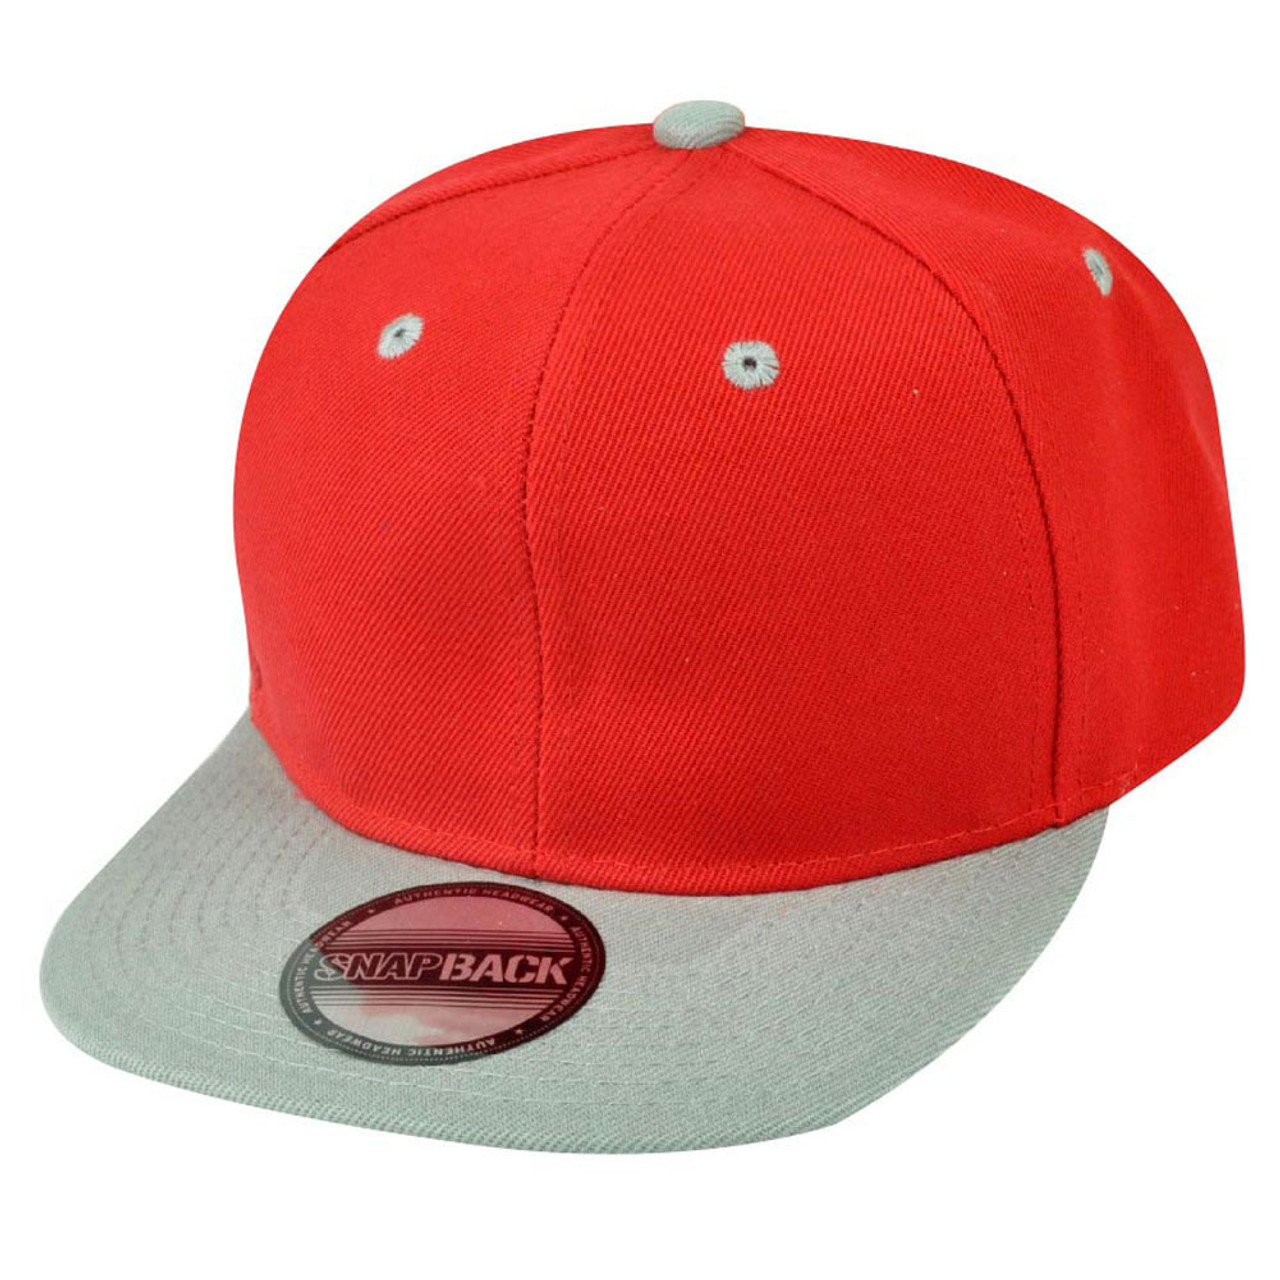 182d770e6e850 Blank Plain Two Tone Red Grey Adjustable Snapback Flat Bill Acrylic Hat Cap